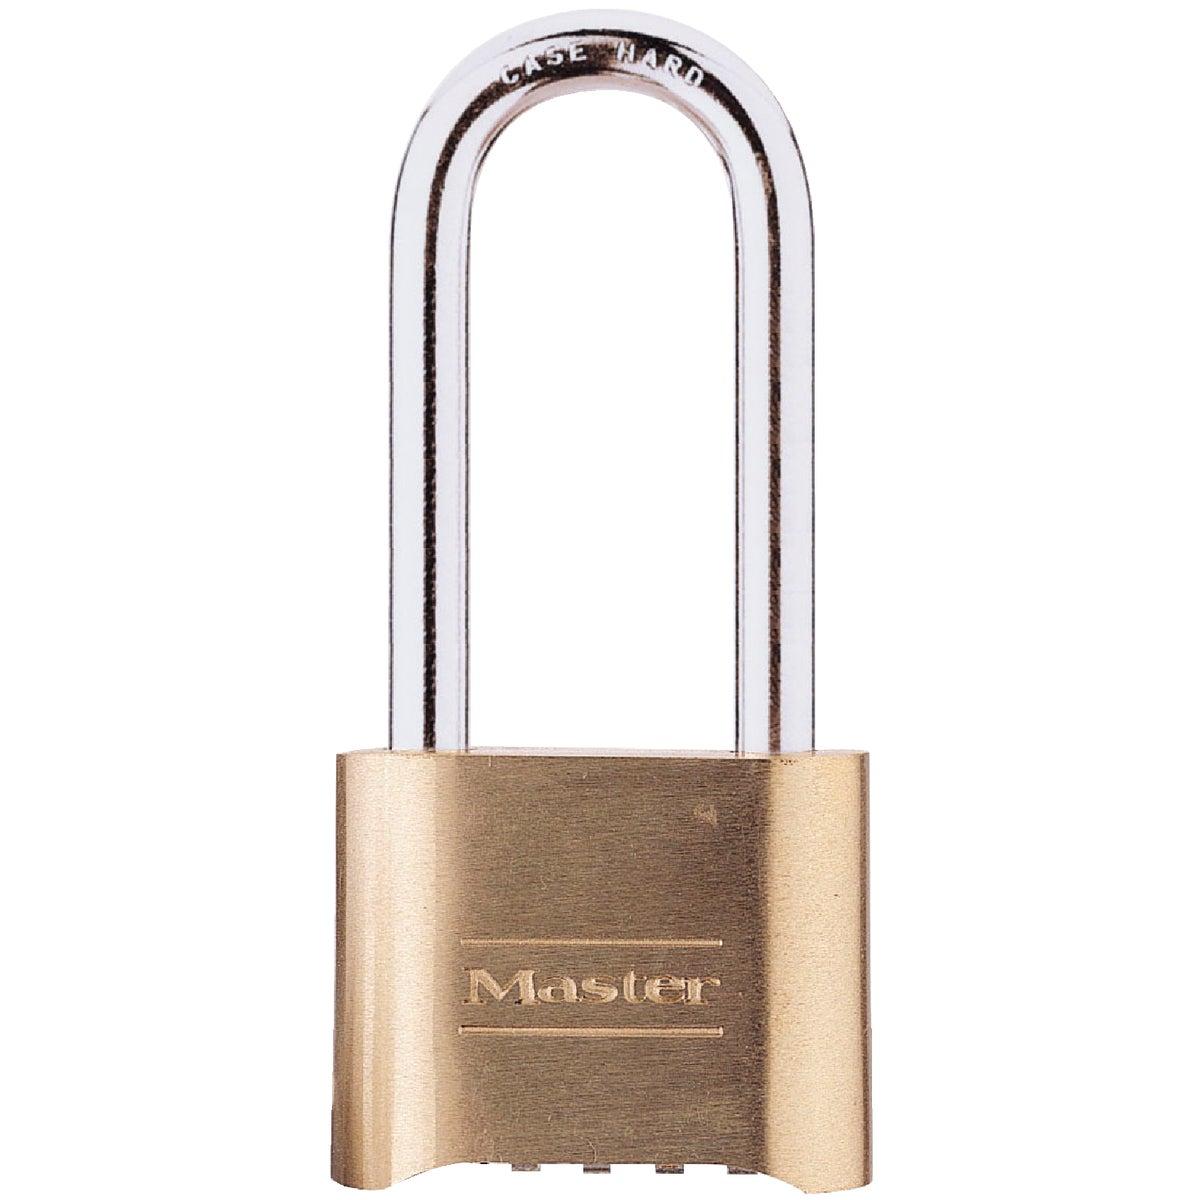 COMBINATION PADLOCK - 175DLH by Master Lock Company